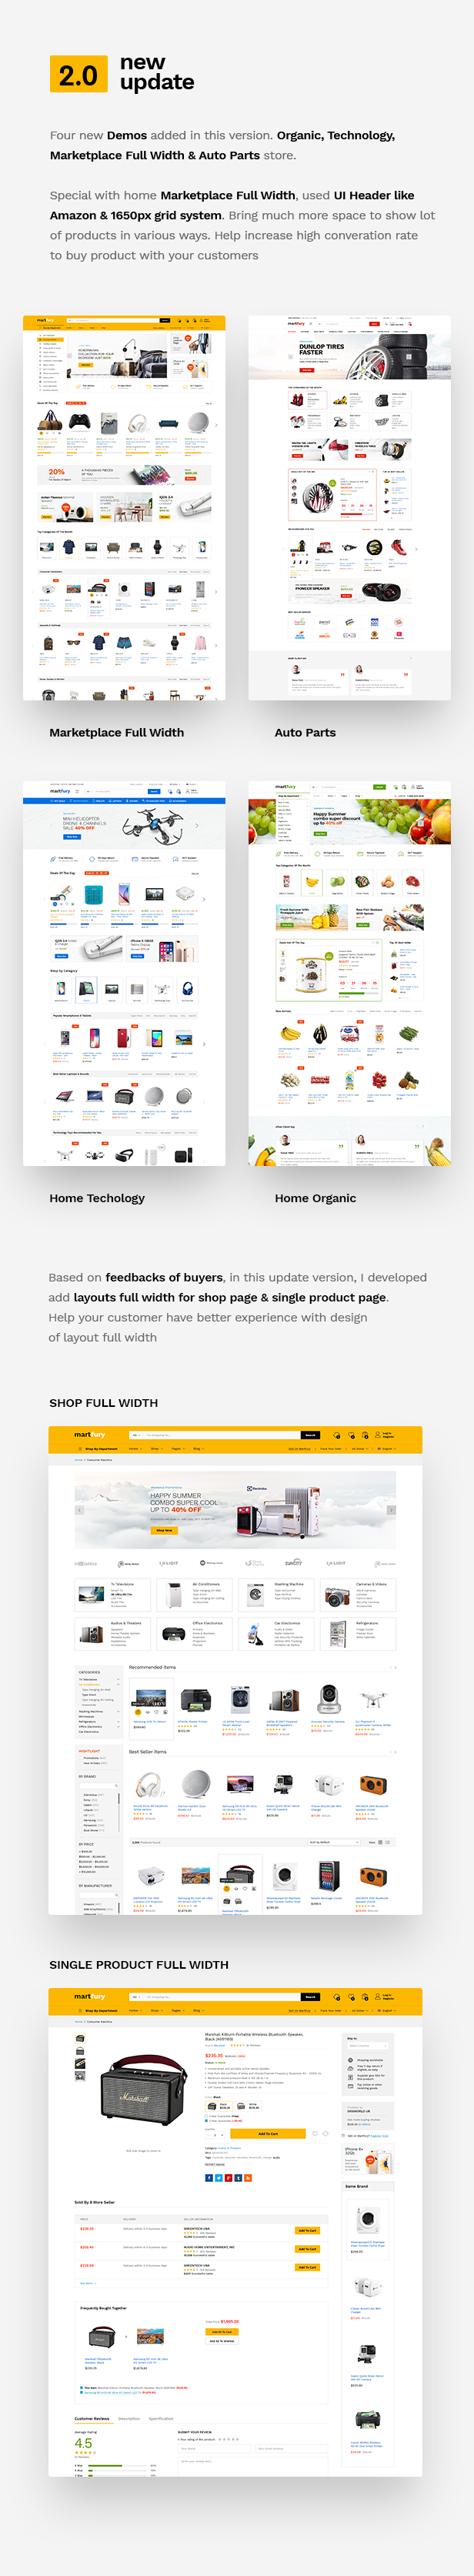 MartFury | Multi-Vendor & Marketplace eCommerce PSD Template - 11